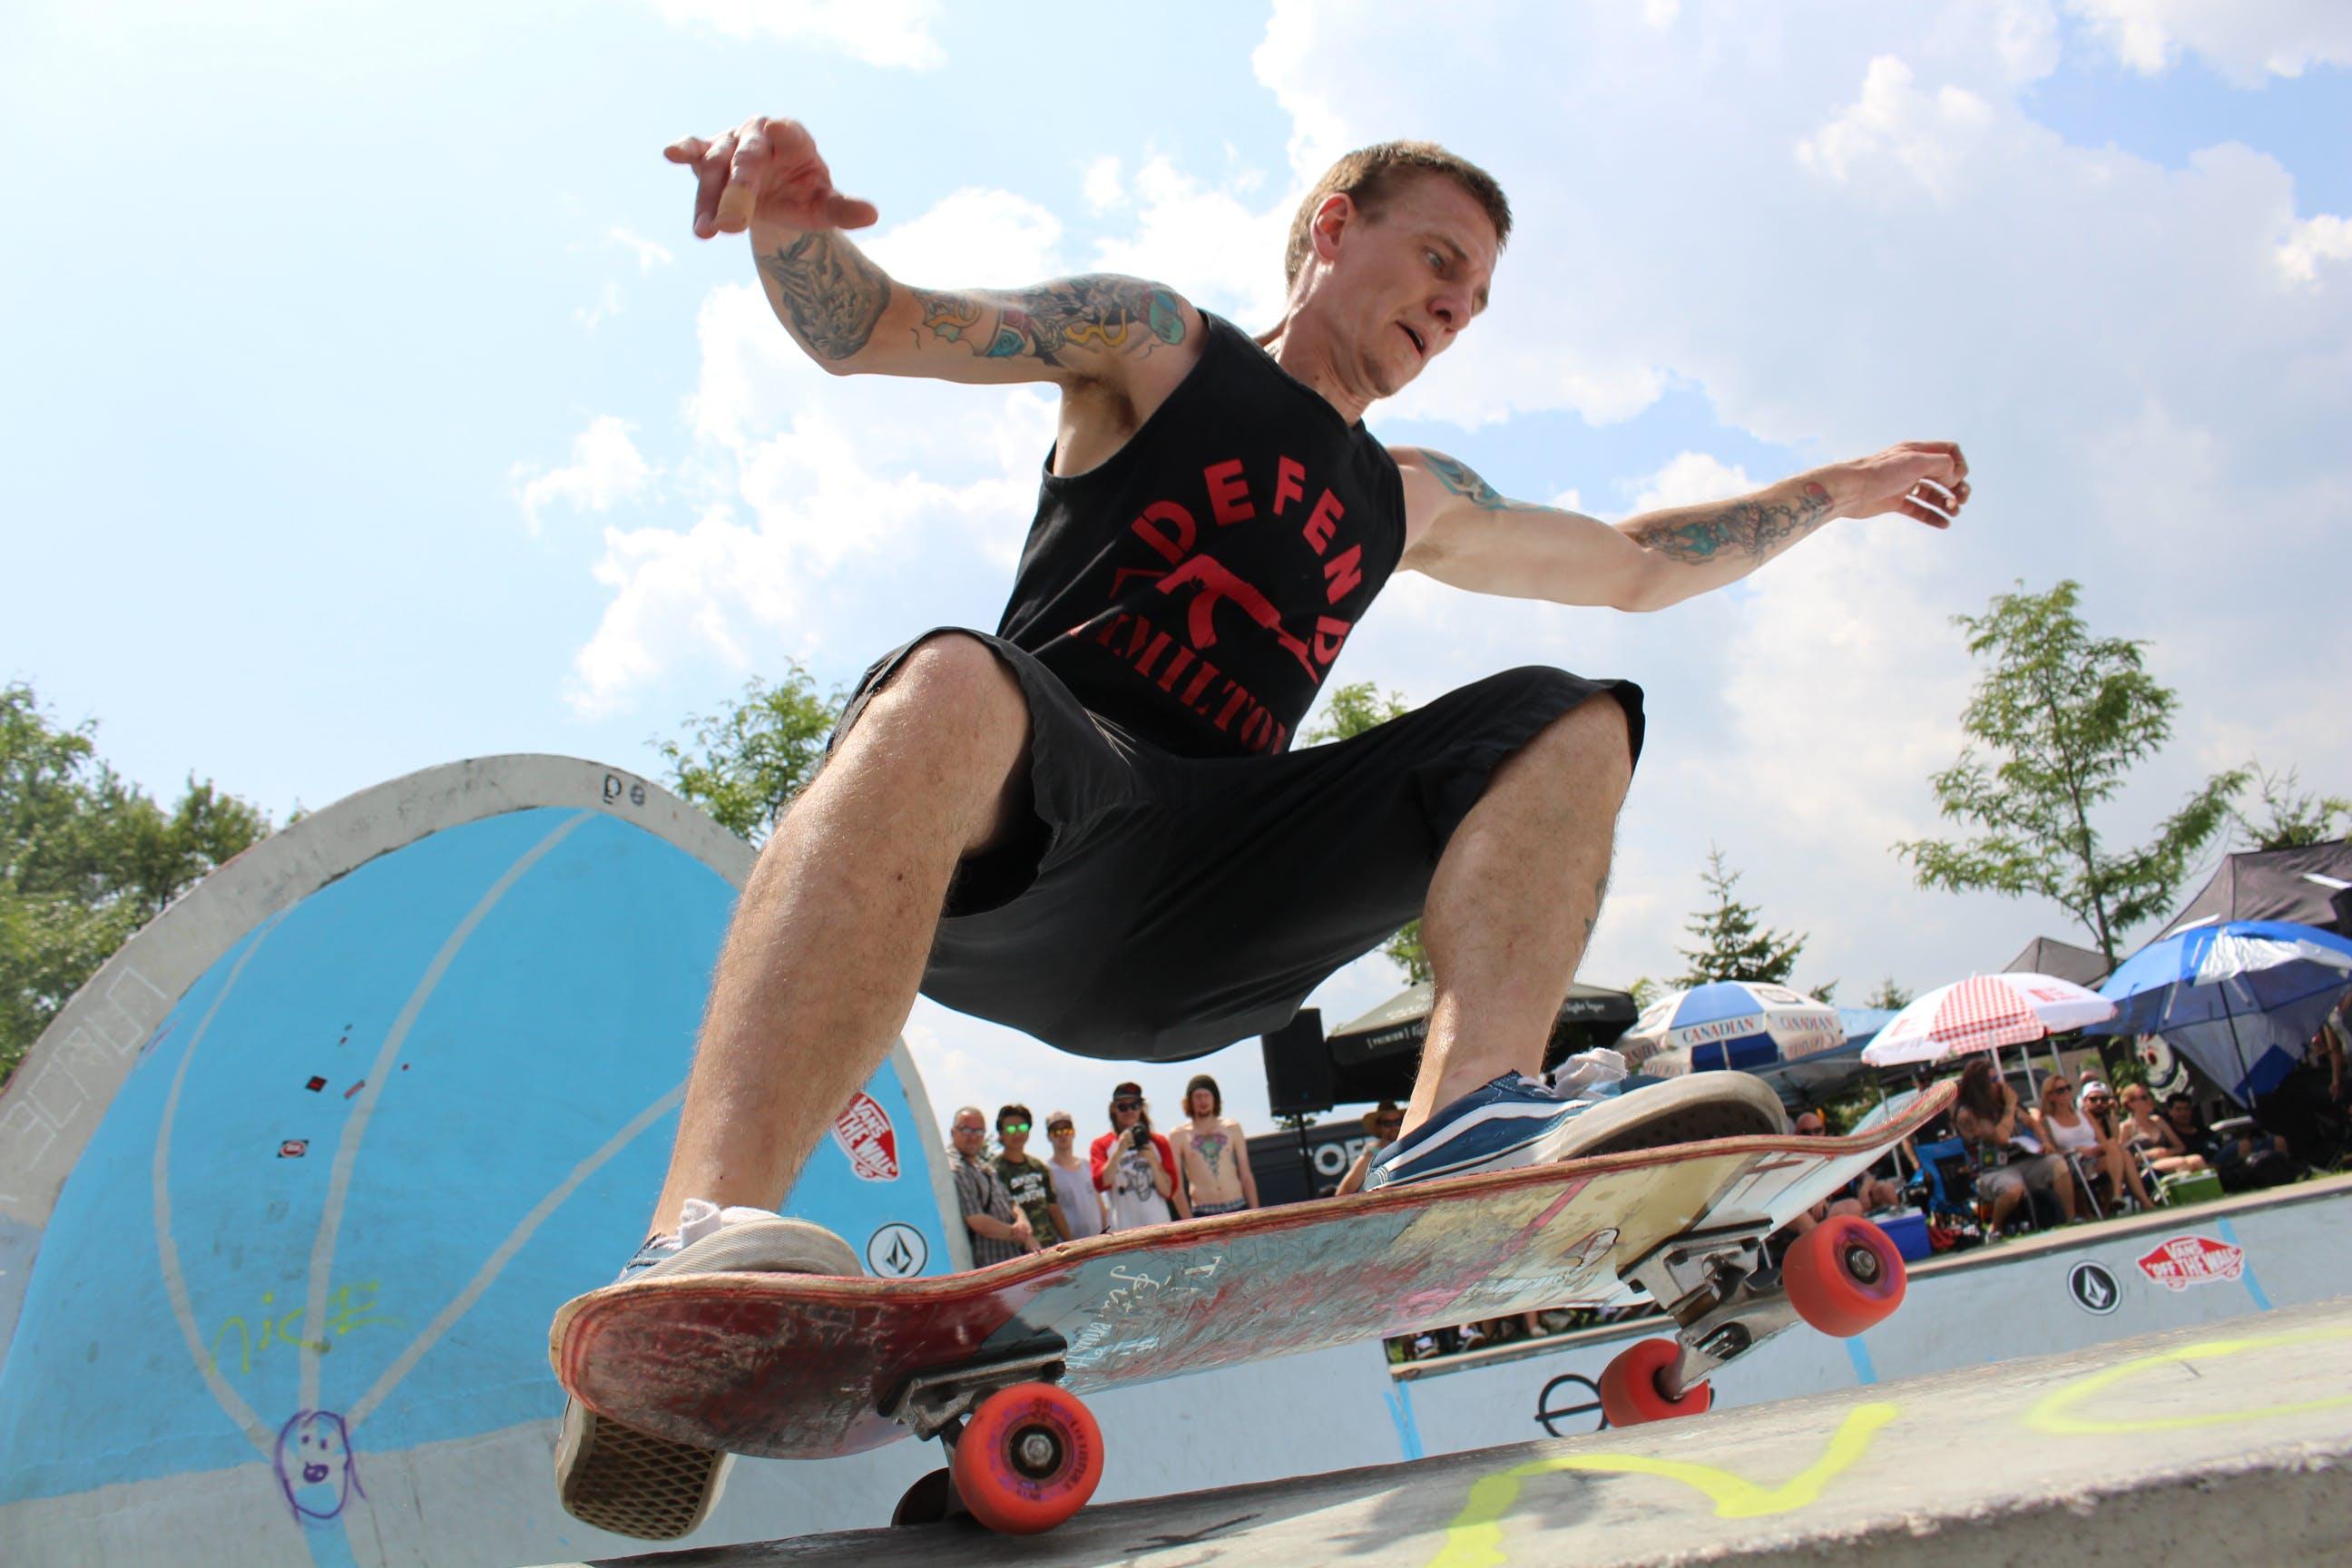 Free stock photo of person, sport, skateboard, skateboarder